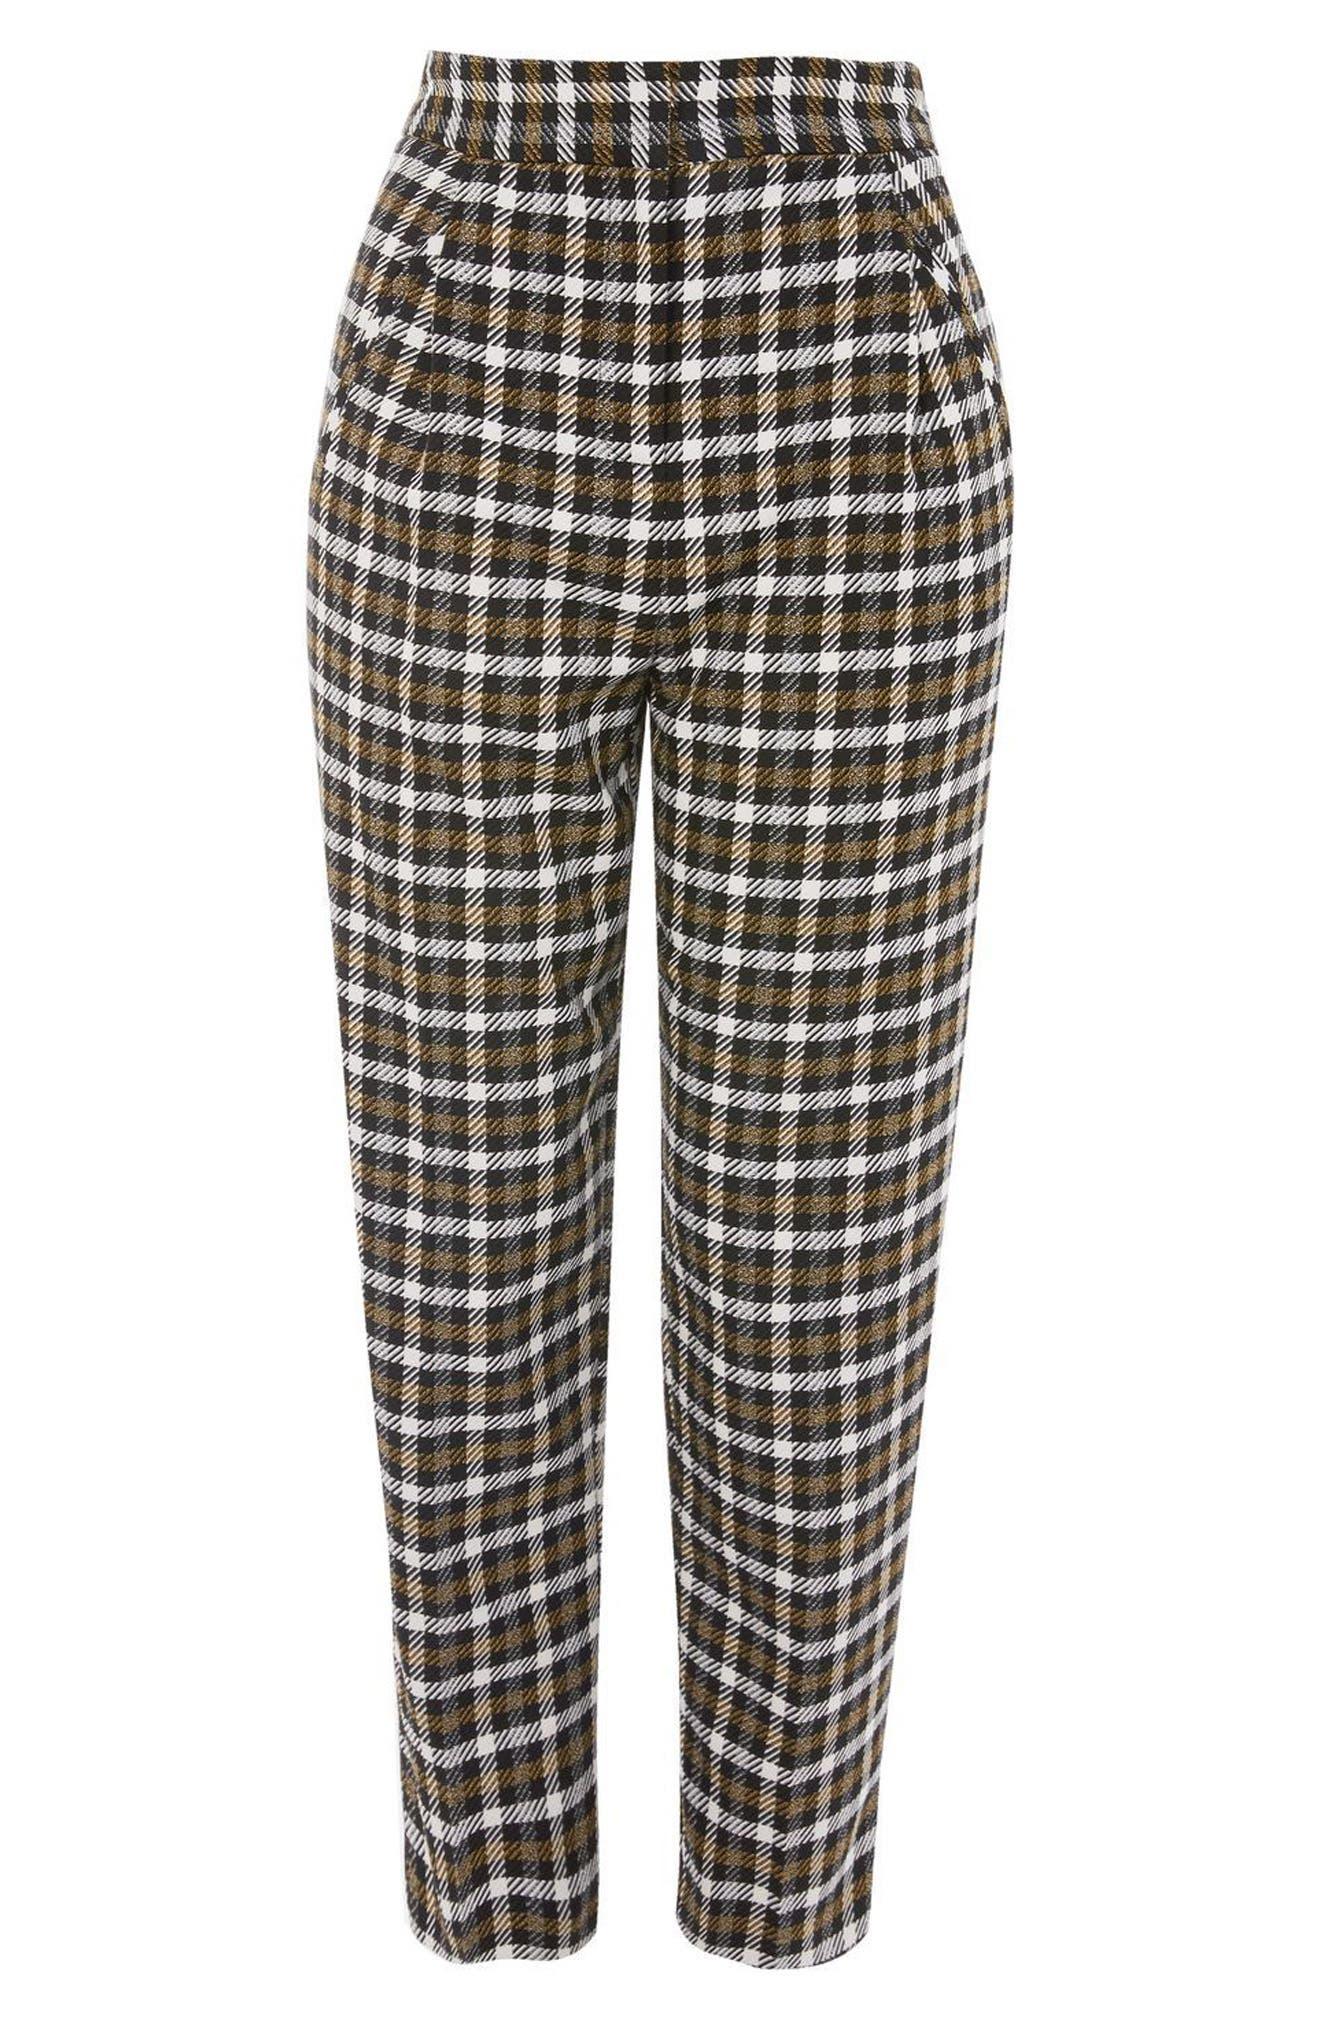 Monica Checked Peg Trousers,                             Alternate thumbnail 3, color,                             001